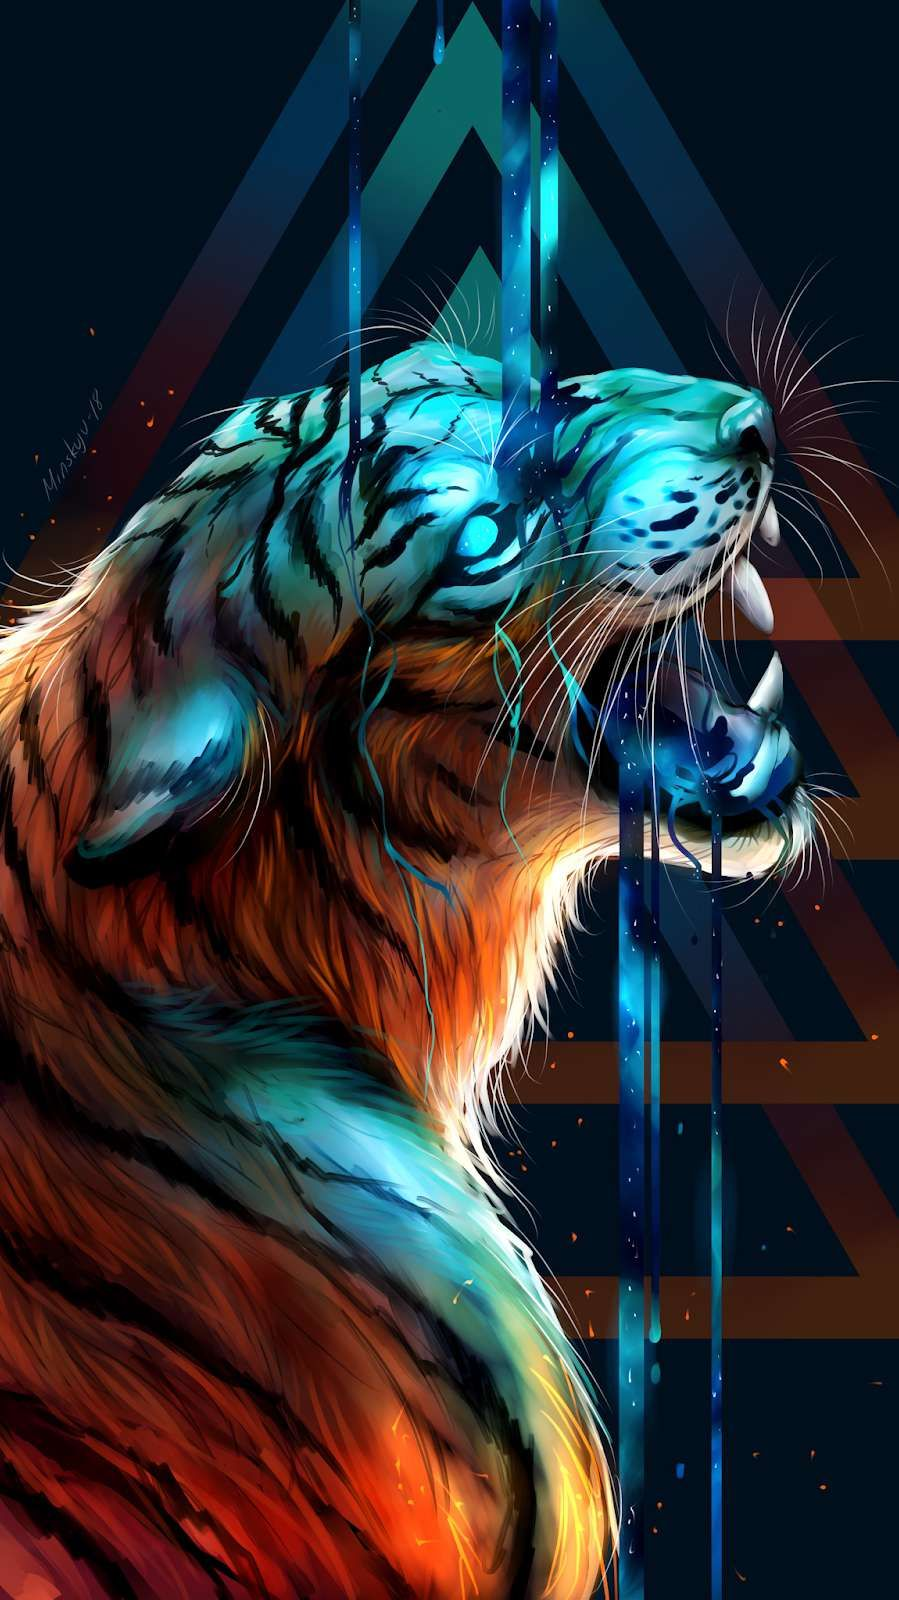 Bengal Tiger Art Iphone Wallpaper Tiger Art Tiger Wallpaper Lion Wallpaper